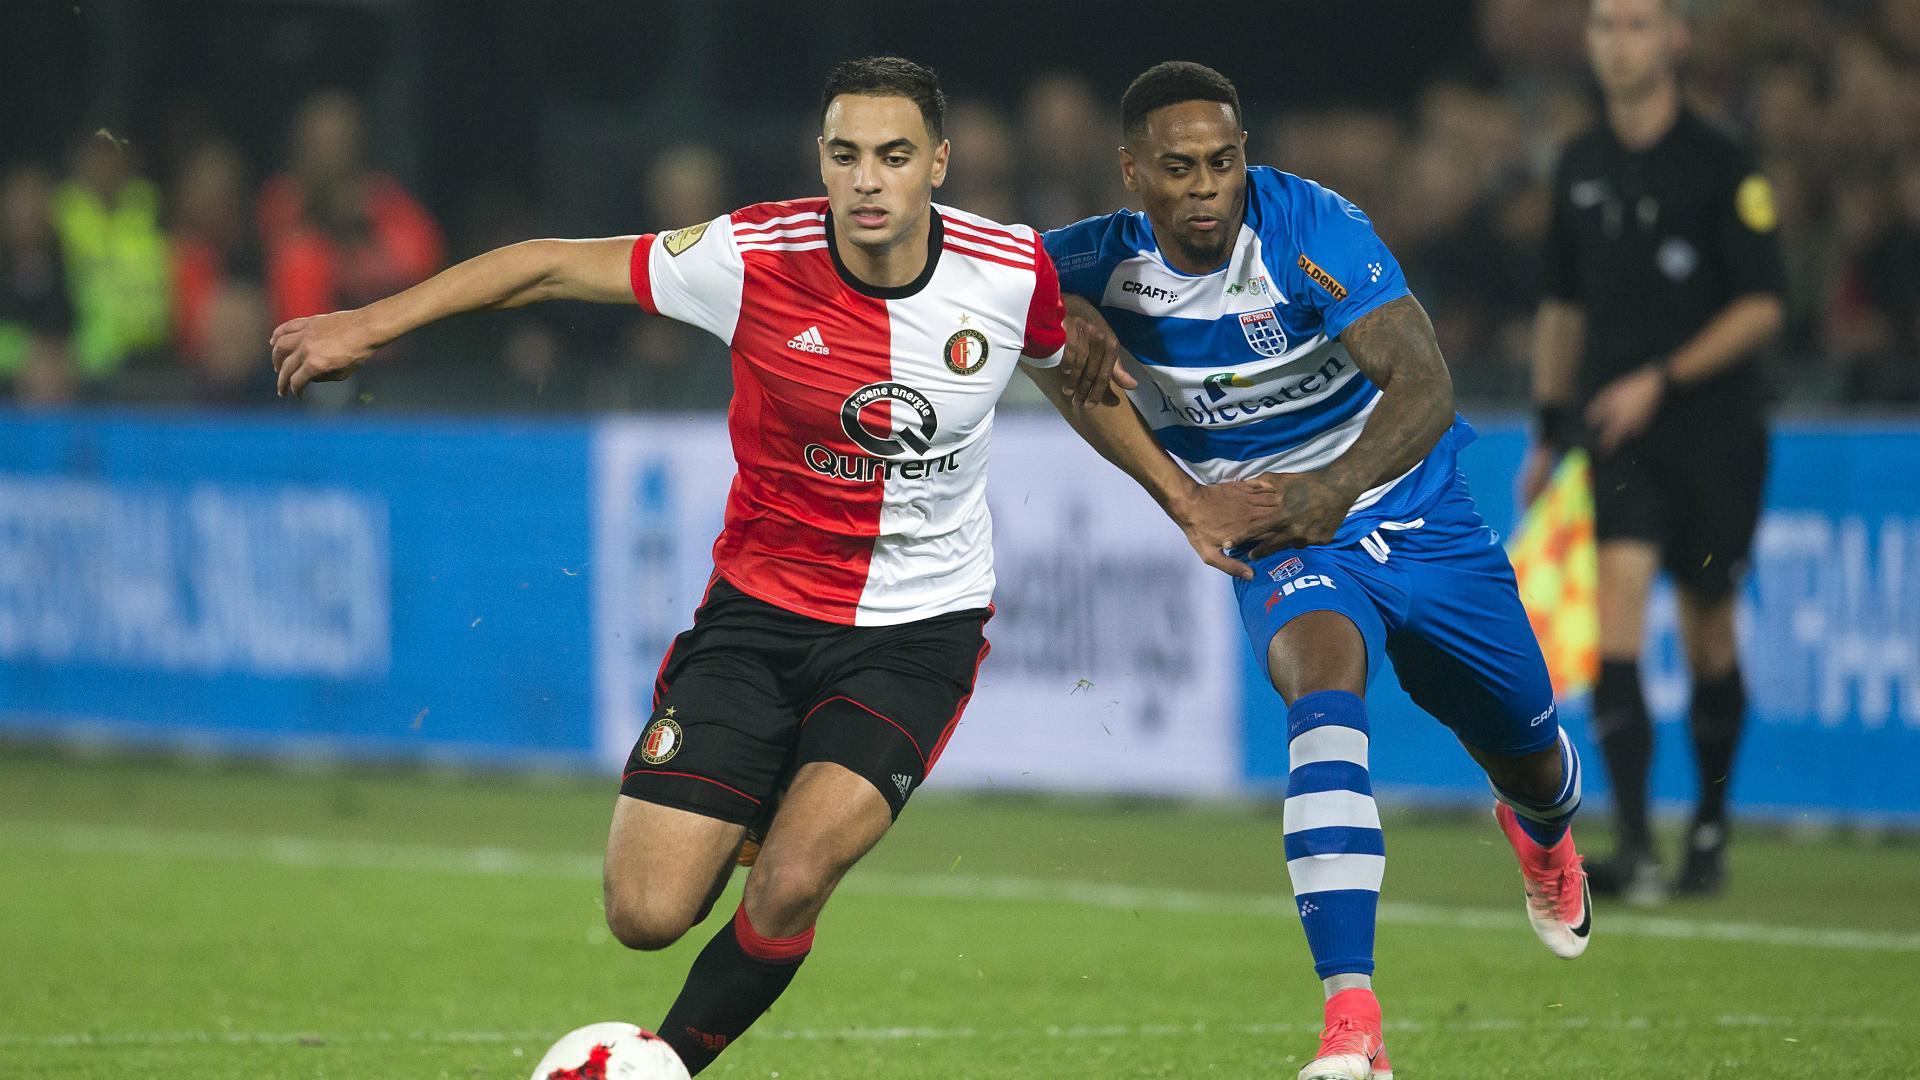 Sofyan Amrabat, Feyenoord - PEC Zwolle, 14102017